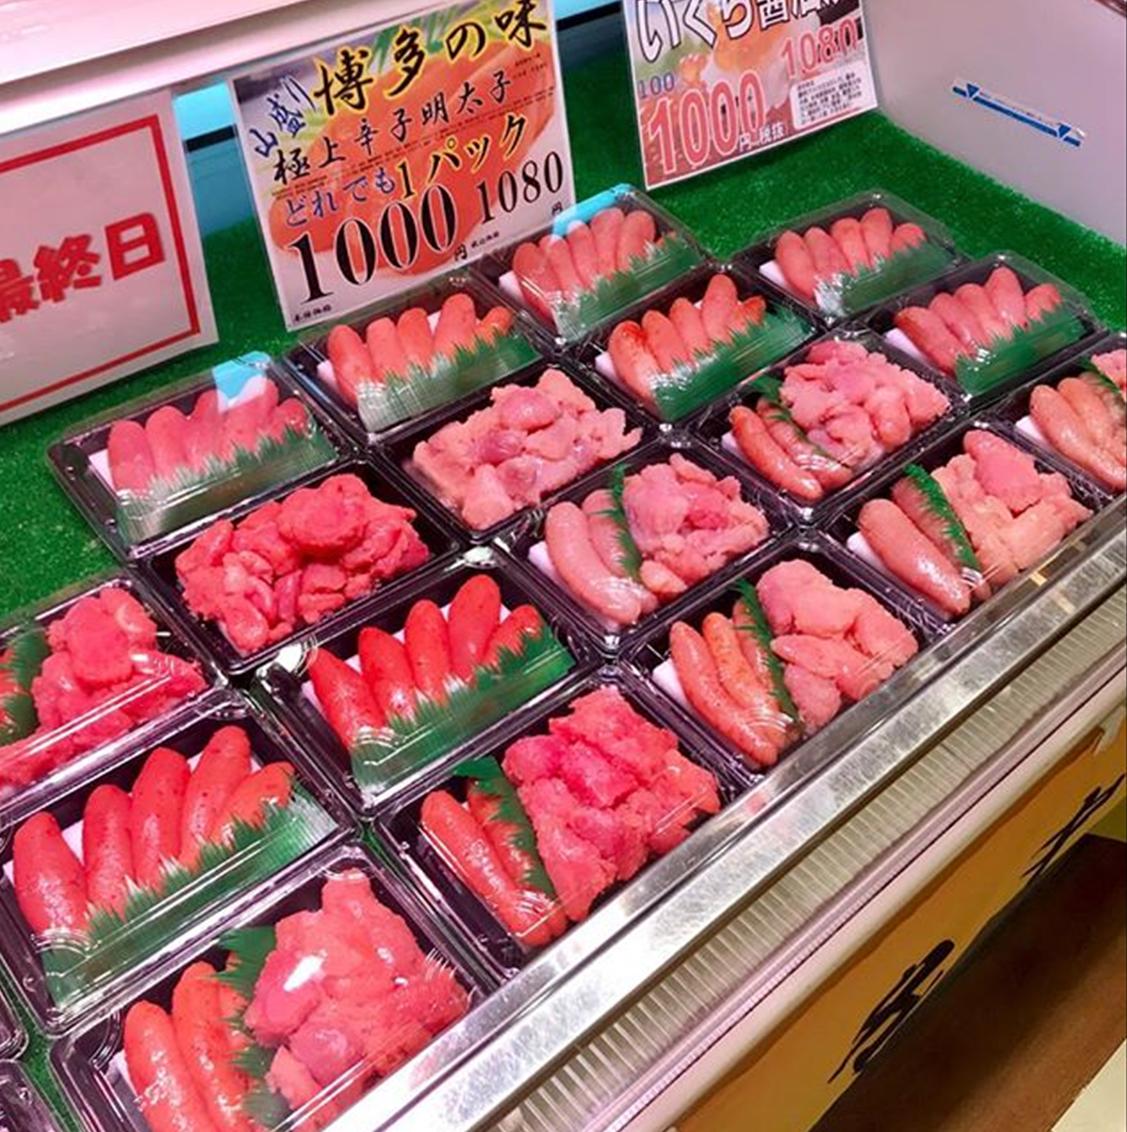 https://shop.gyorankobo.jp/wp-content/uploads/2020/04/博多中唄④.png